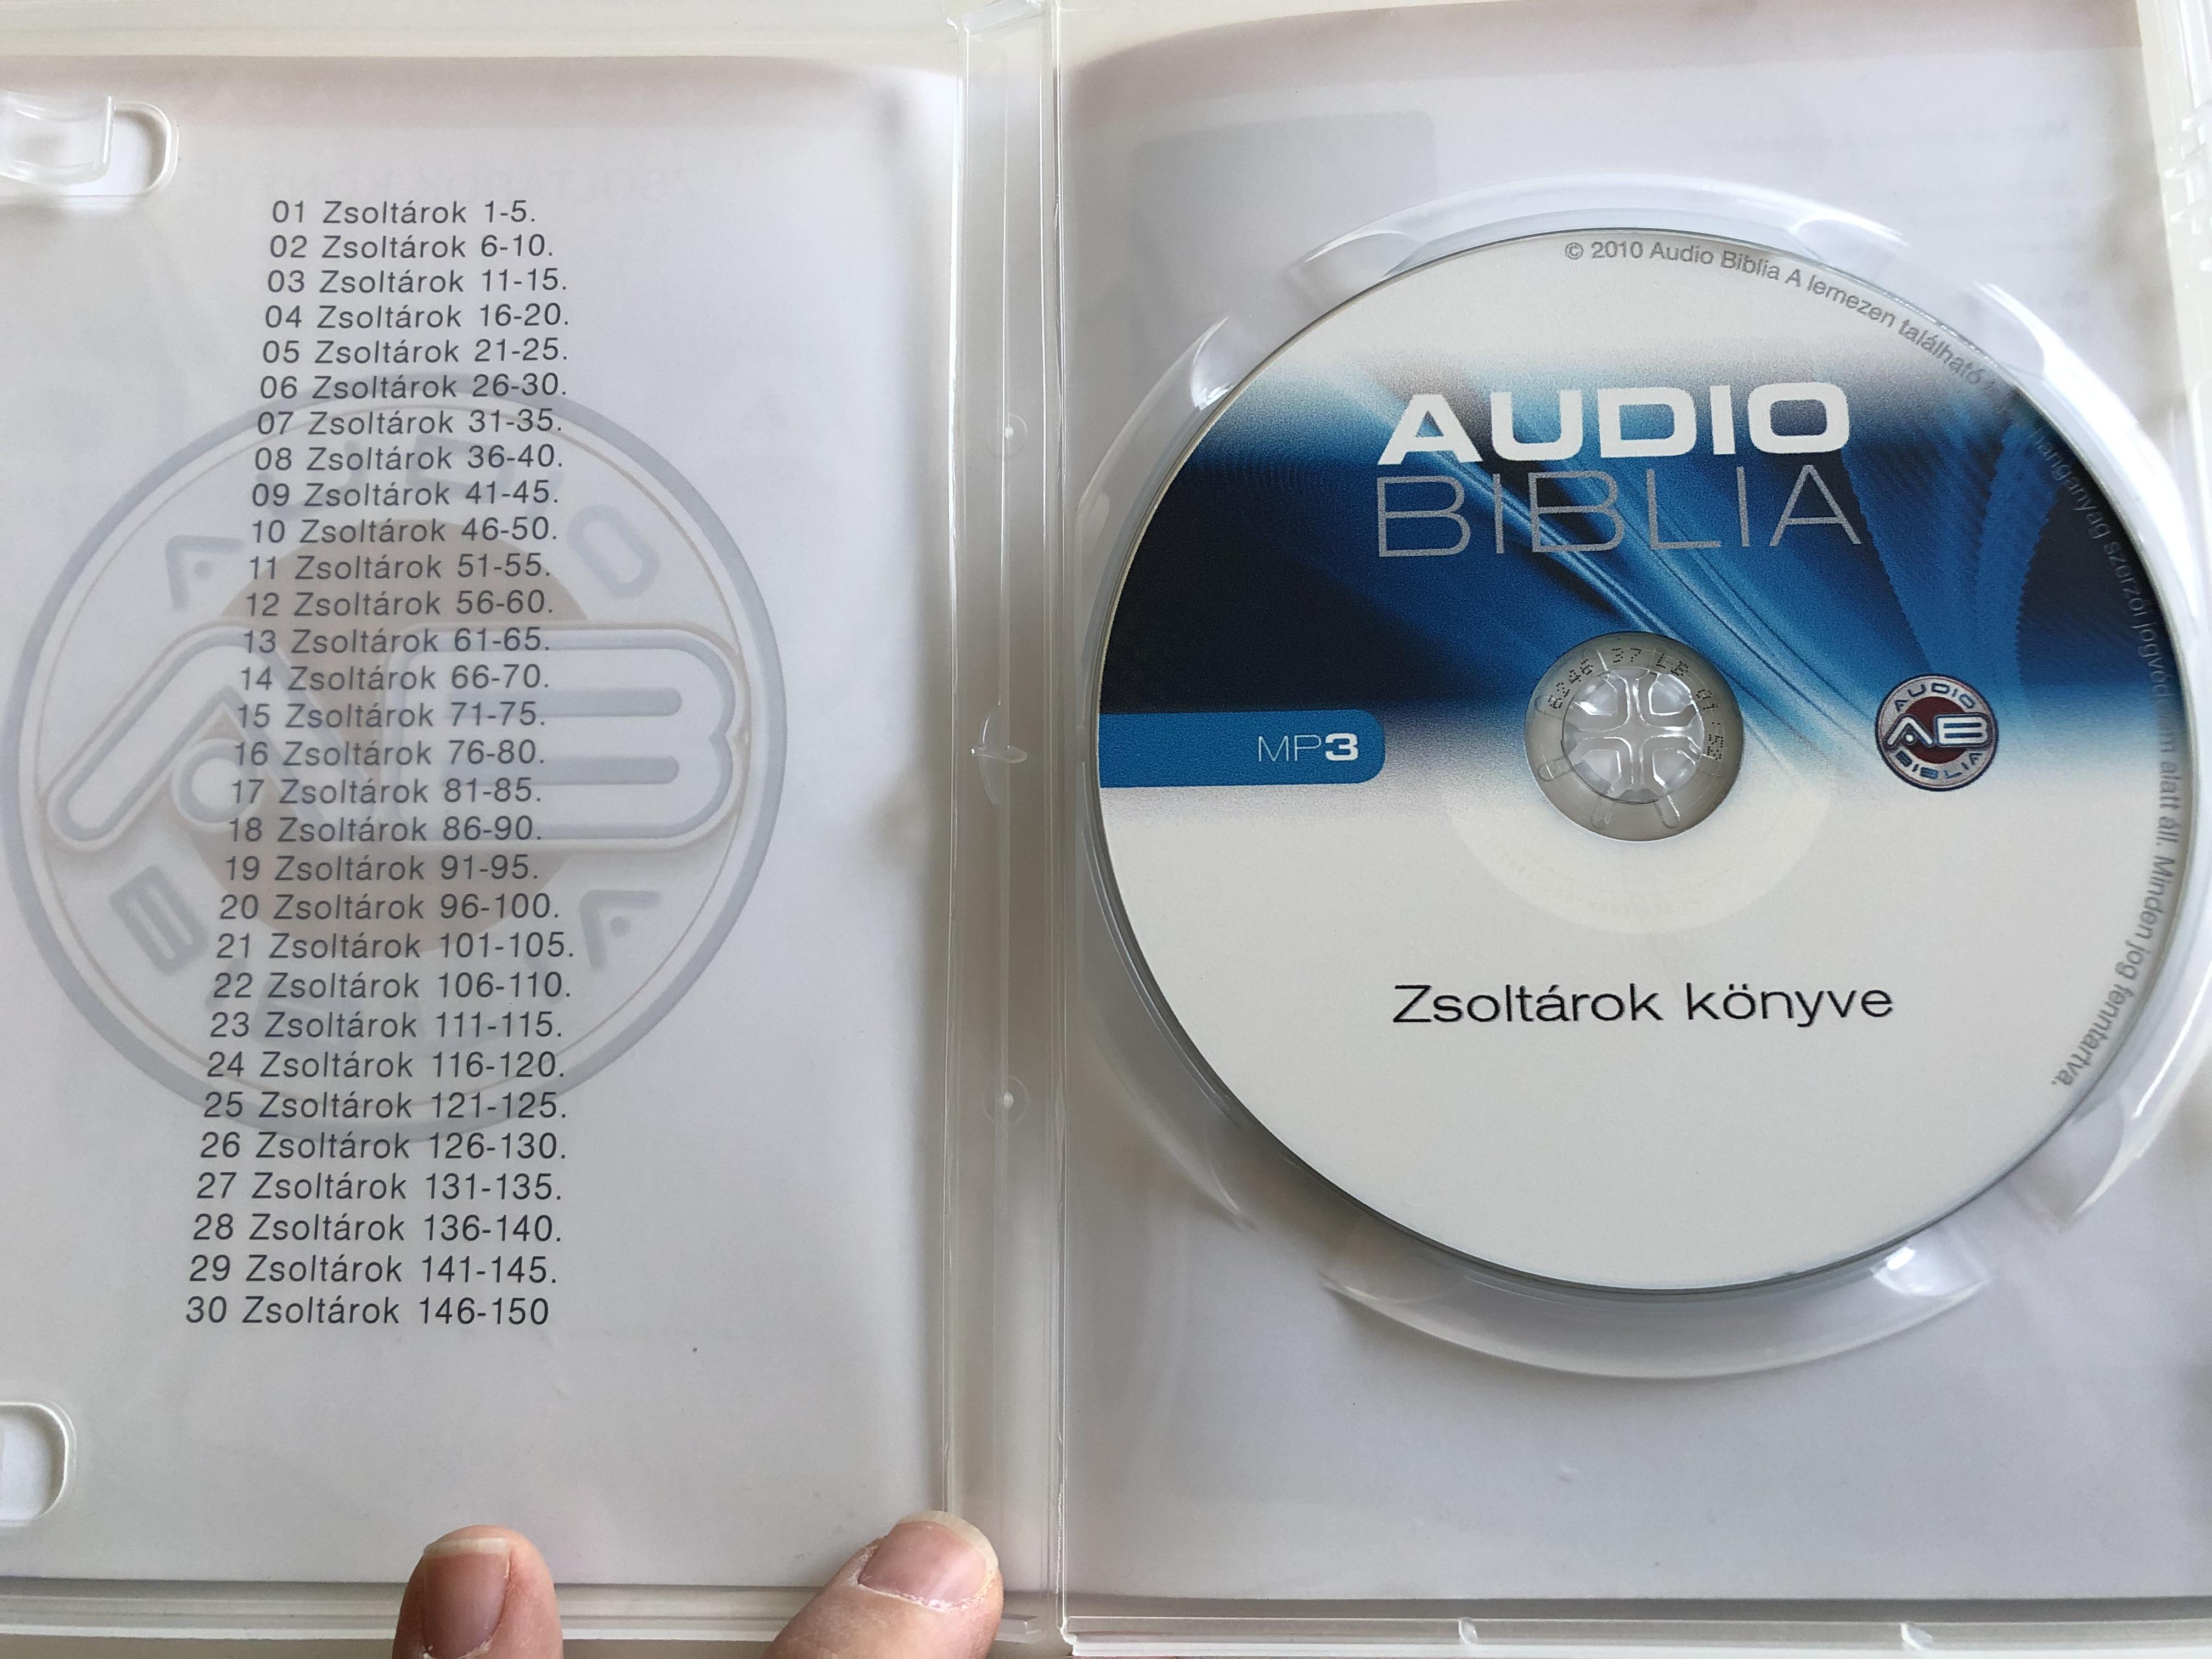 audio-biblia-zsolt-rok-k-nyve-t-th-g-za-el-ad-s-ban-hungarian-language-audio-bible-the-book-of-psalms-read-by-t-th-g-za-mp3-audio-cd-2010-audiobiblia.hu-3-.jpg